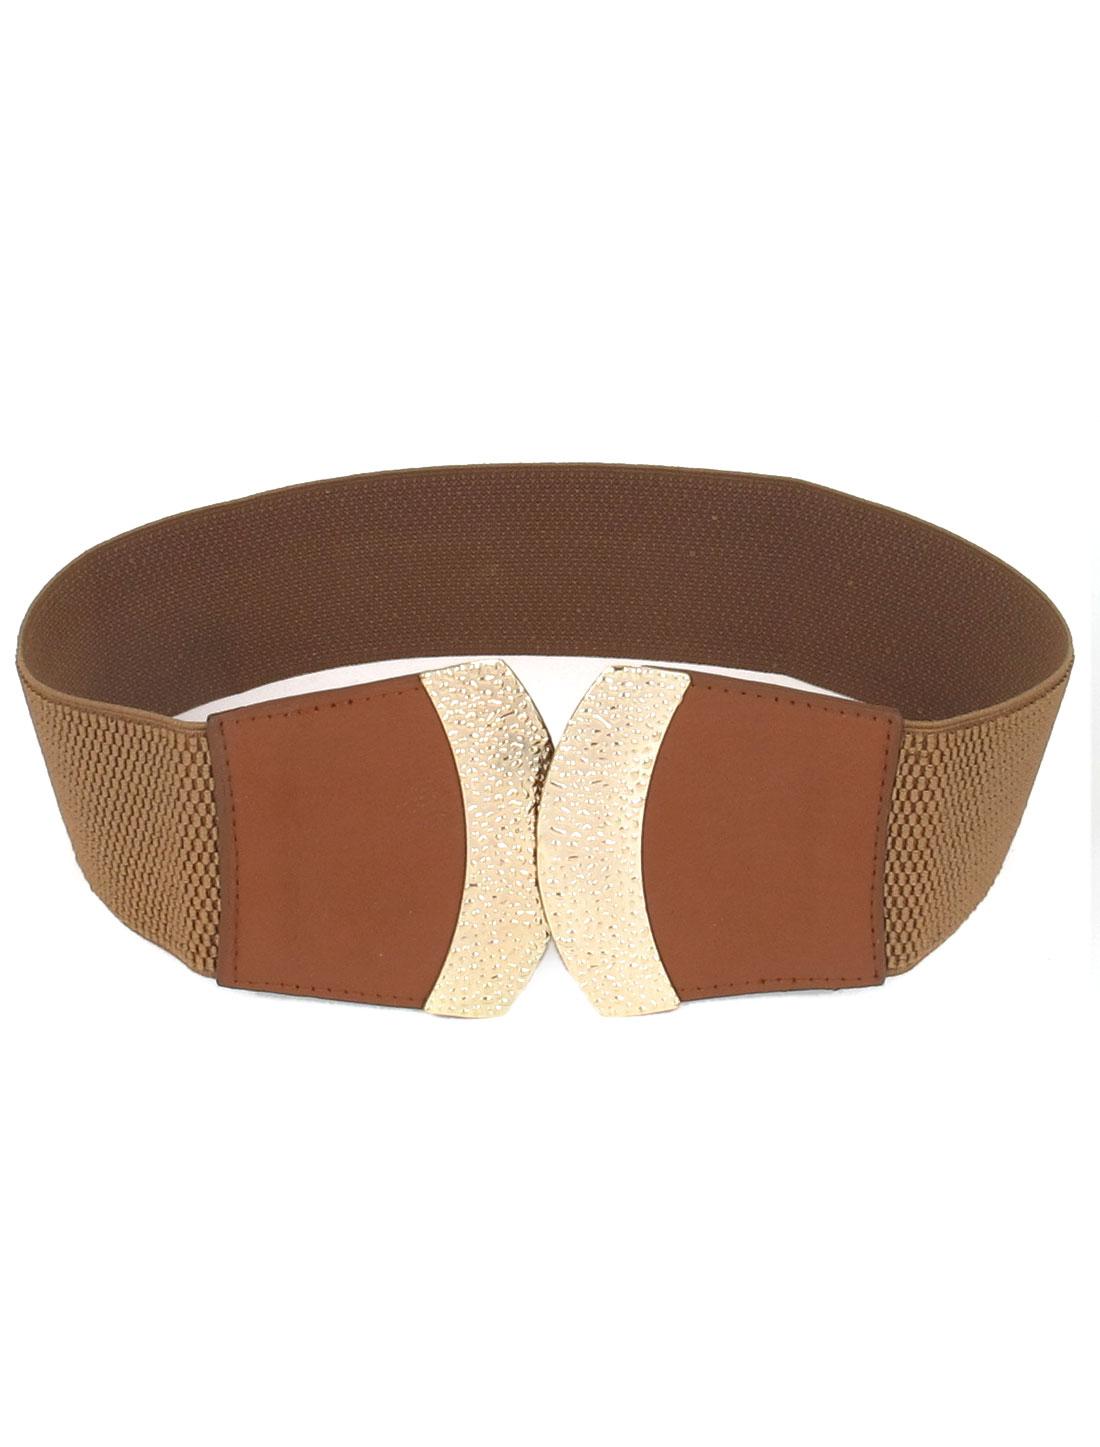 Women Metal Interlocking Buckle Faux Leather Cinch 6cm Width Waist Belt Band Waistband Brown